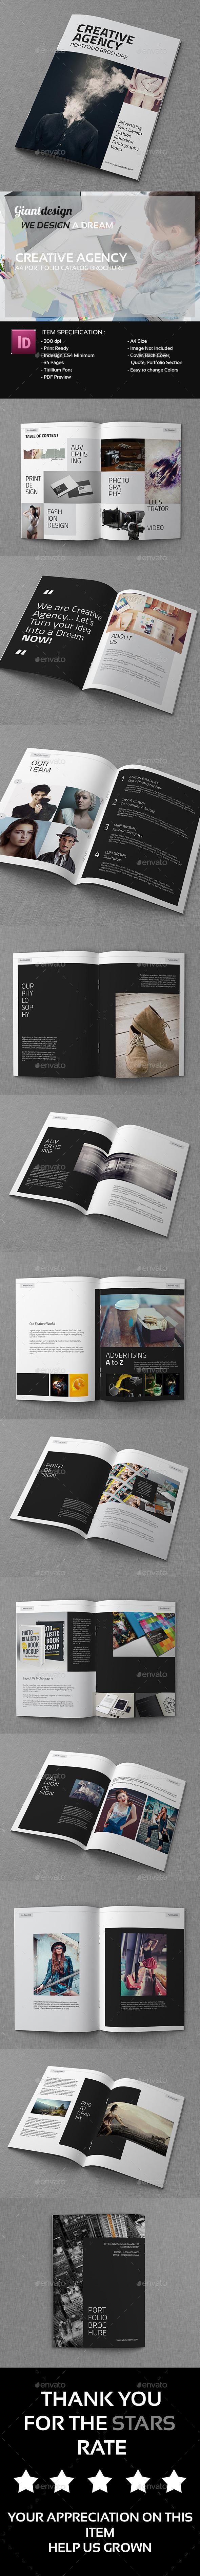 Creative Agency - A4 Portfolio Catalog Brochure - Portfolio Brochures